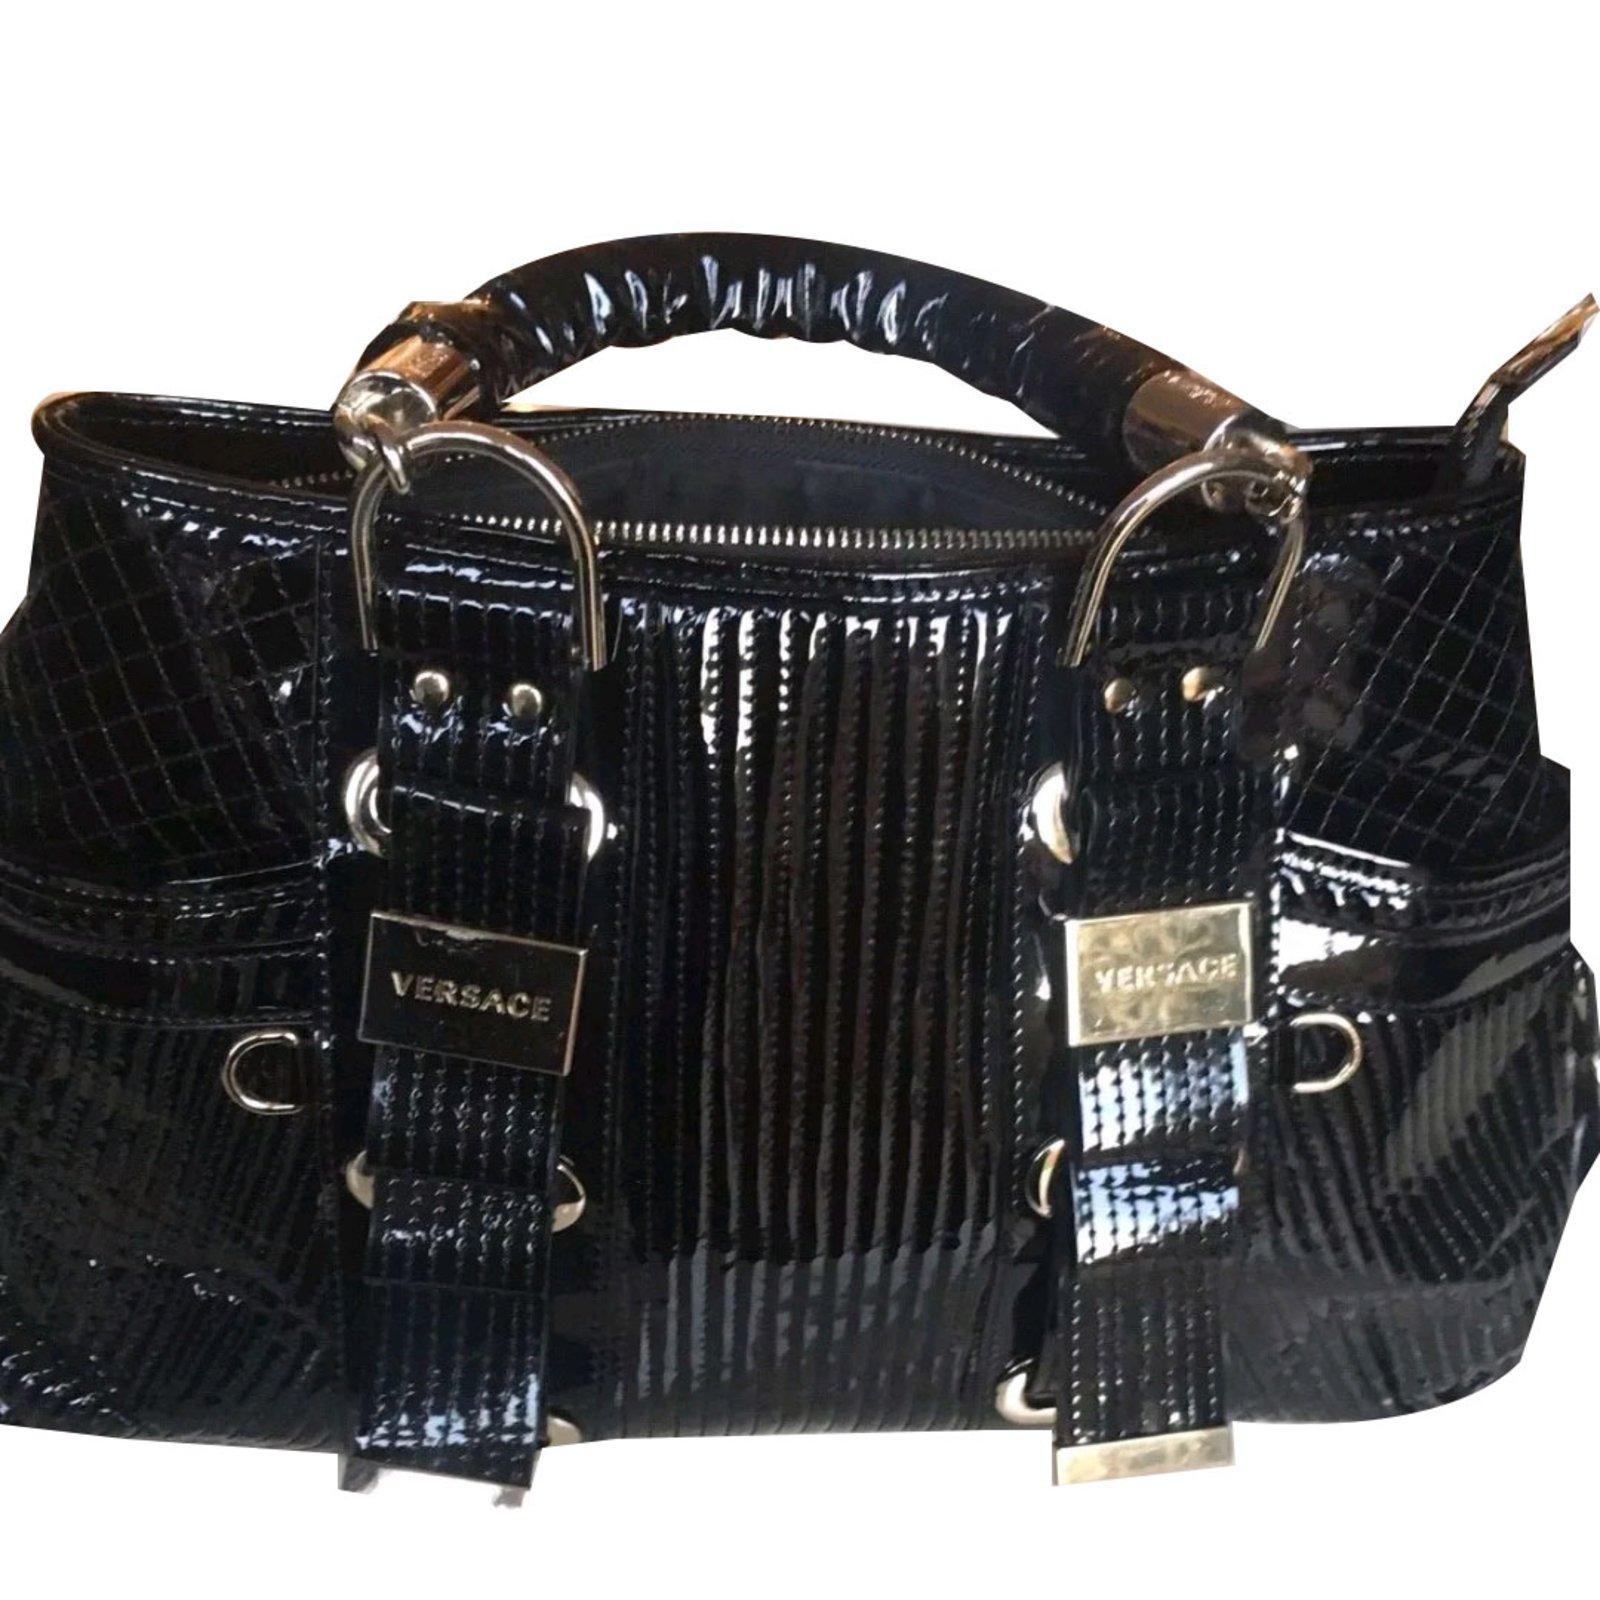 be140c7fb1 Gianni Versace Handbag Handbags Patent leather Black